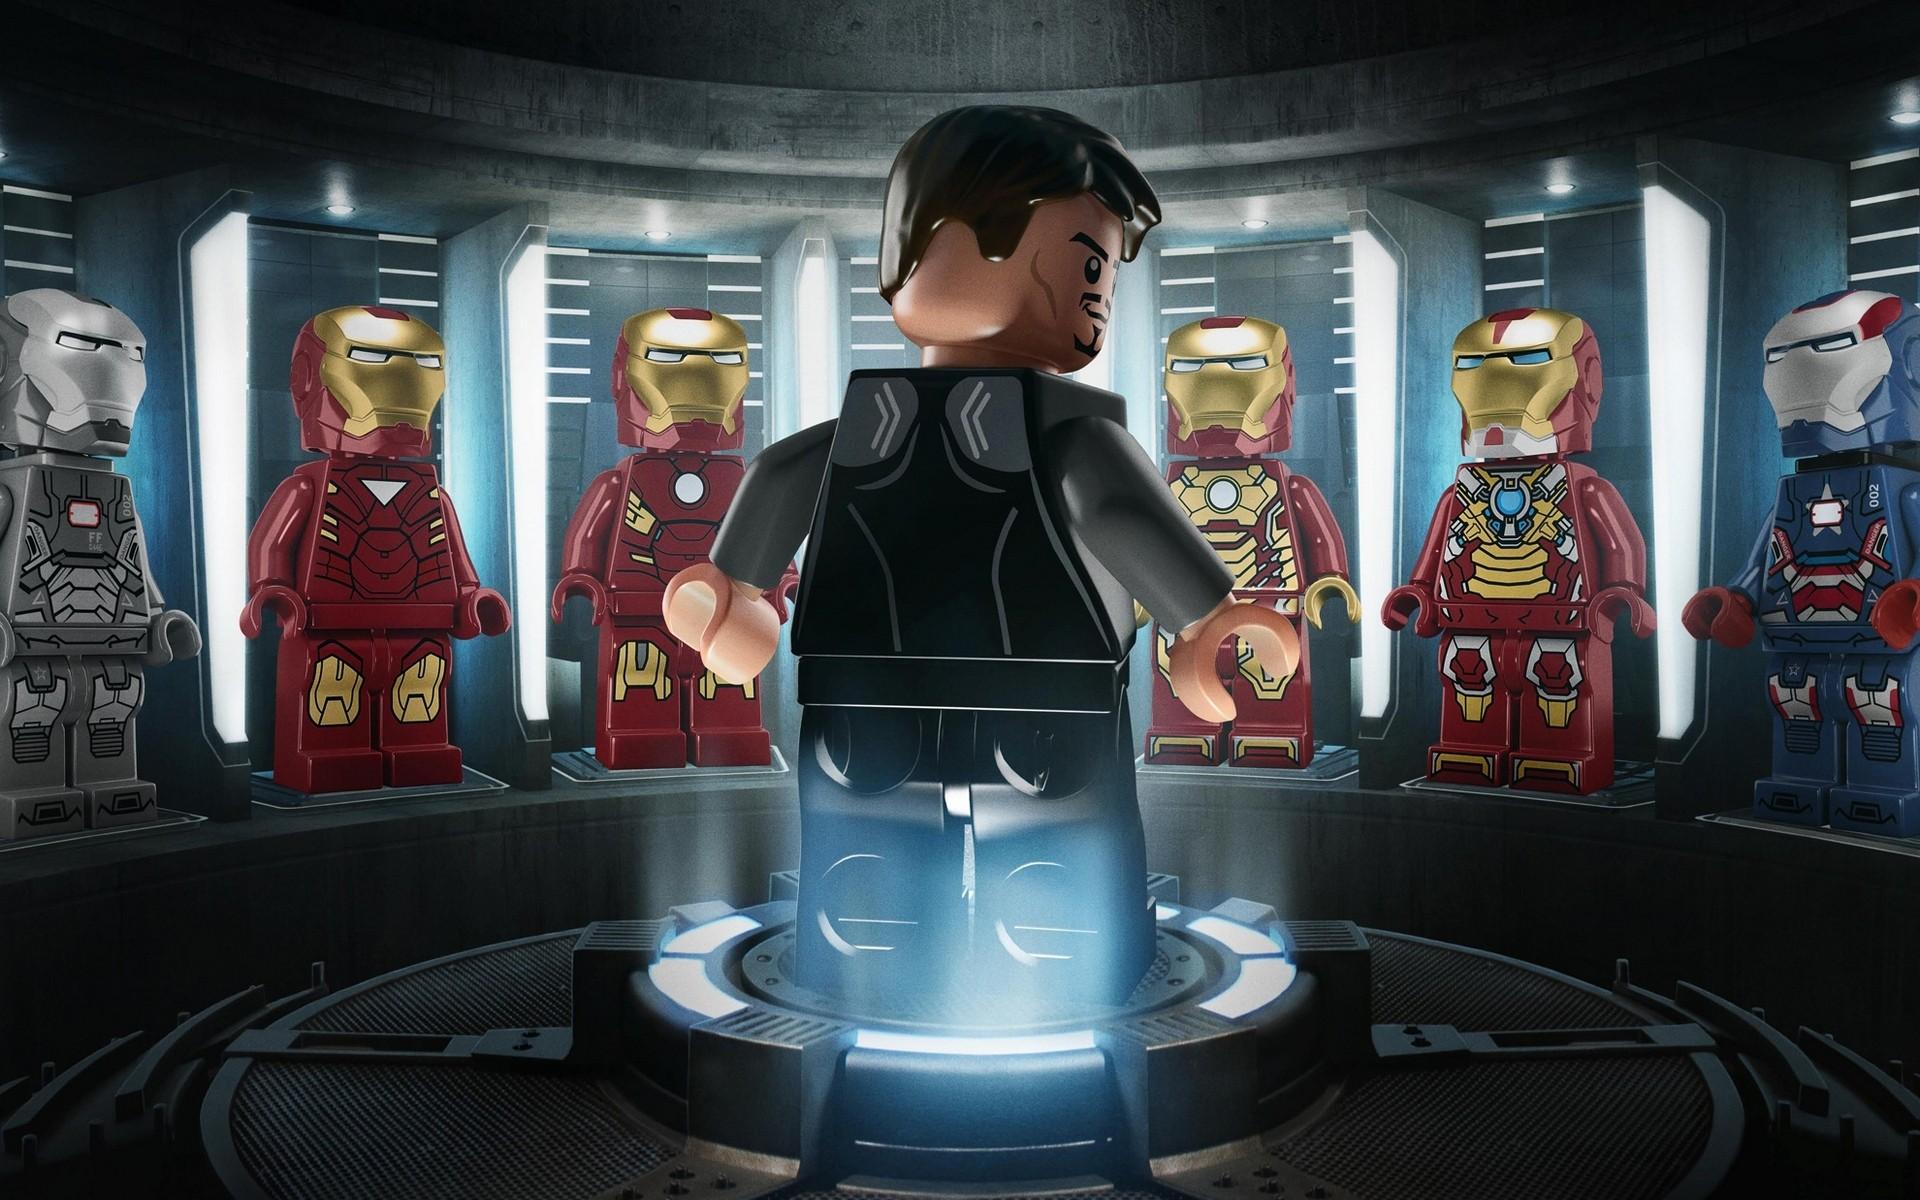 download wallpaper: LEGO Iron Man wallpaper